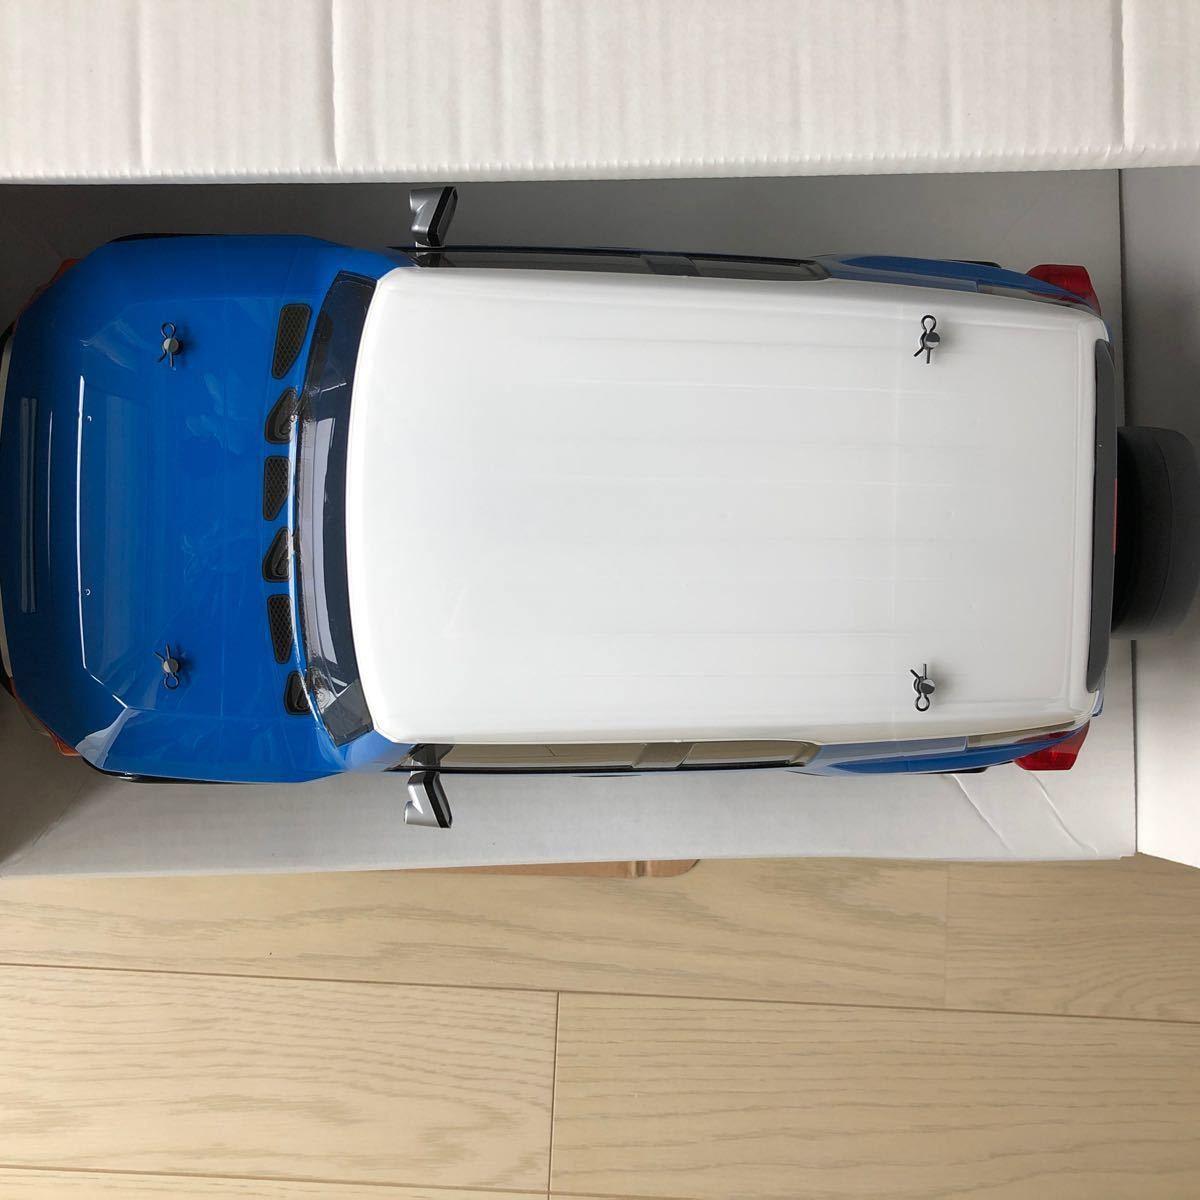 1/10RC XB トヨタ FJクルーザーCC-01シャーシTAMIYA送料無料